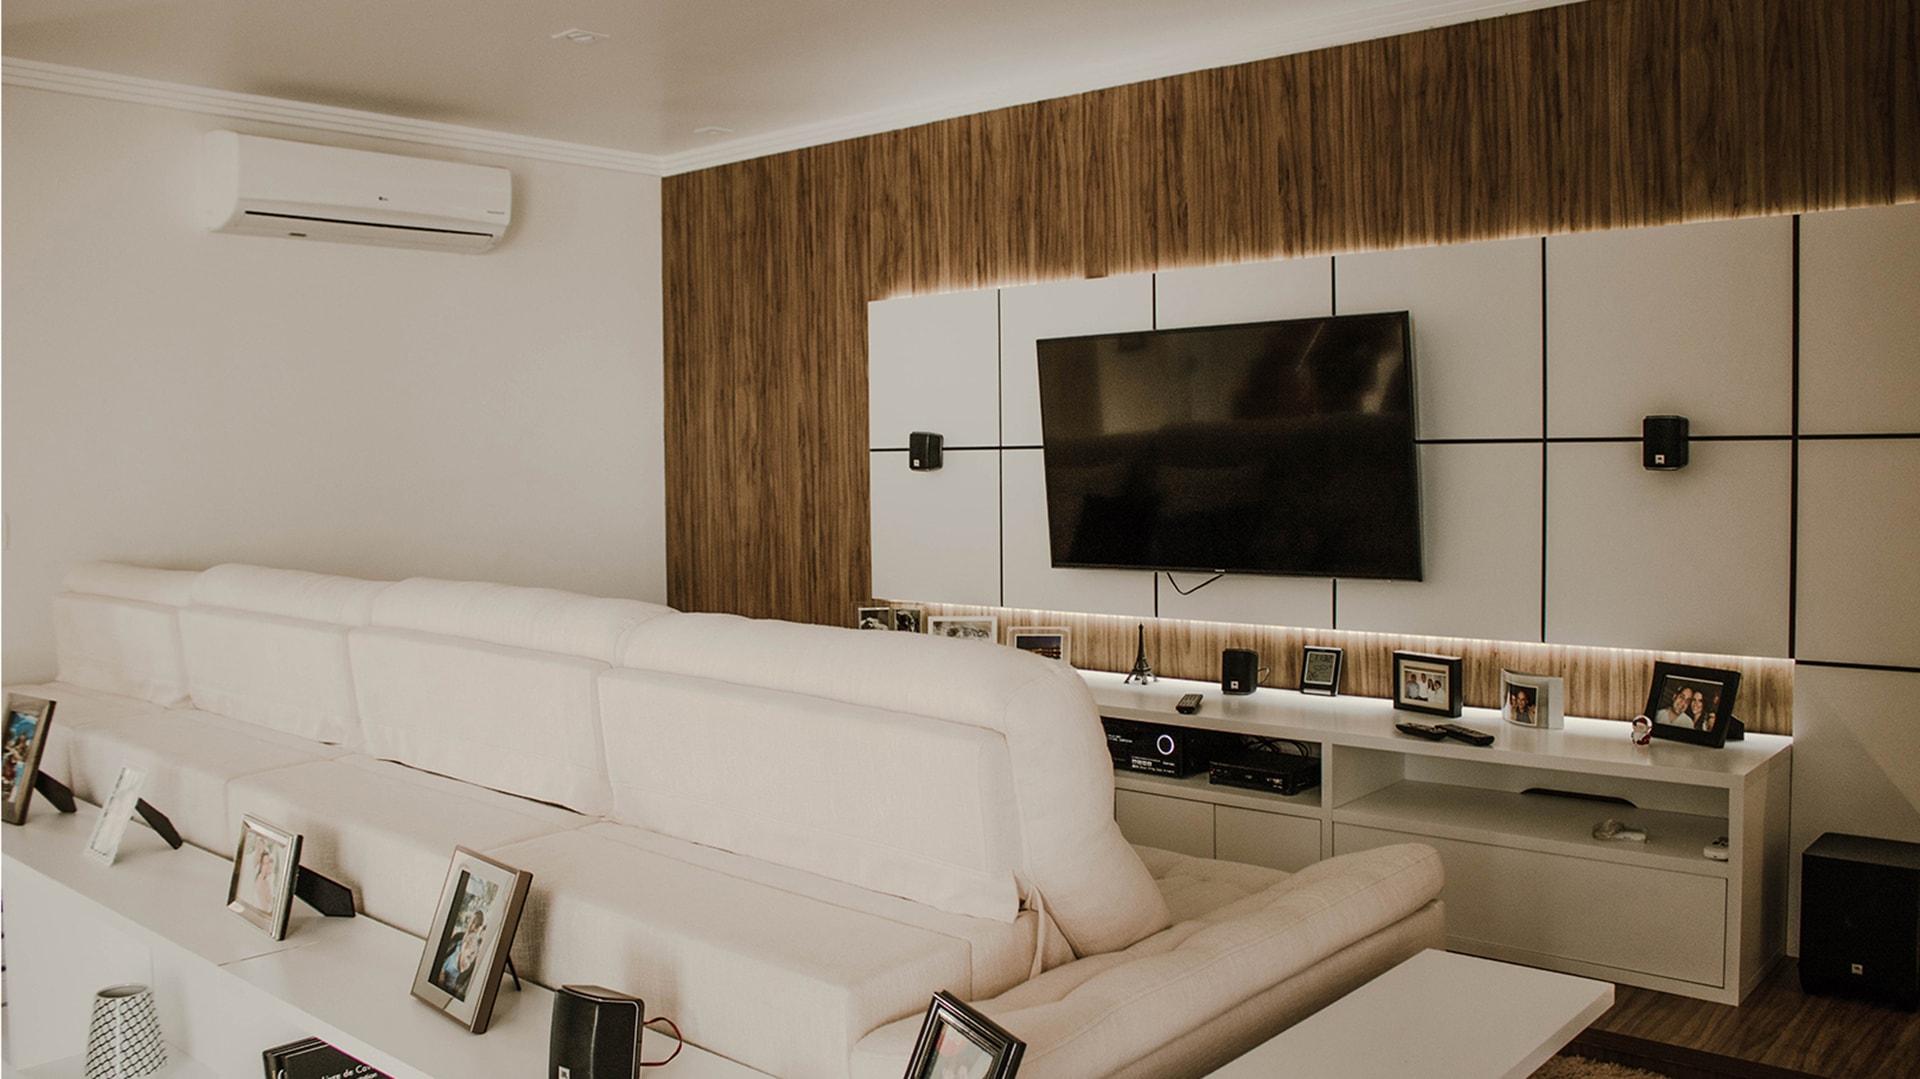 Residencial - 50m² - Alphaville - Santana de Parnaíba - SP